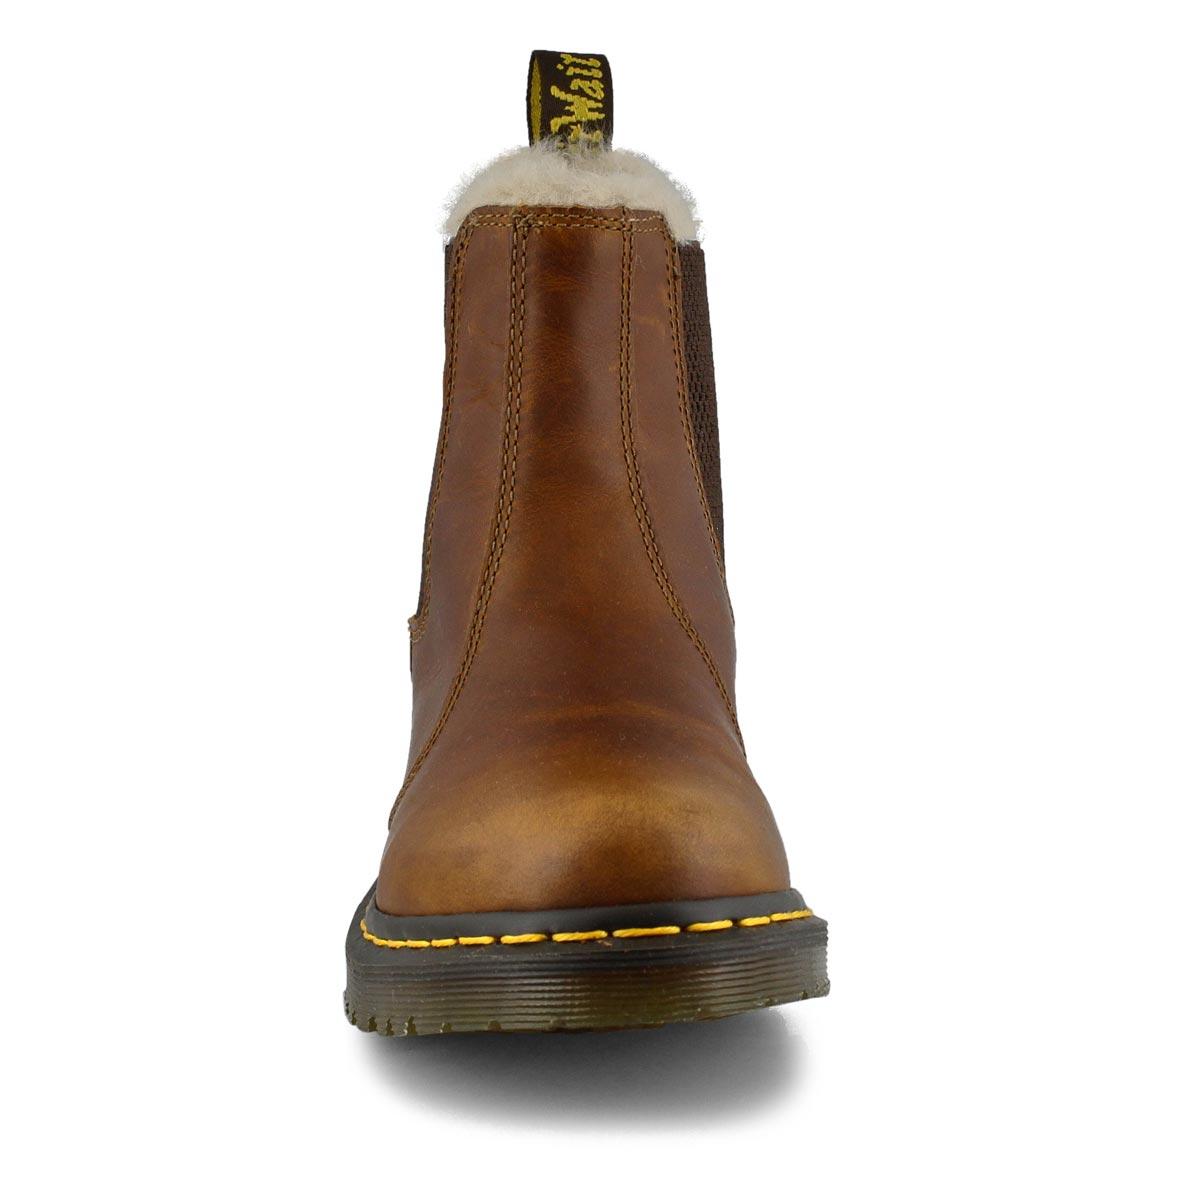 Women's 2976 Leonore Chelsea Boot - Butterscotch